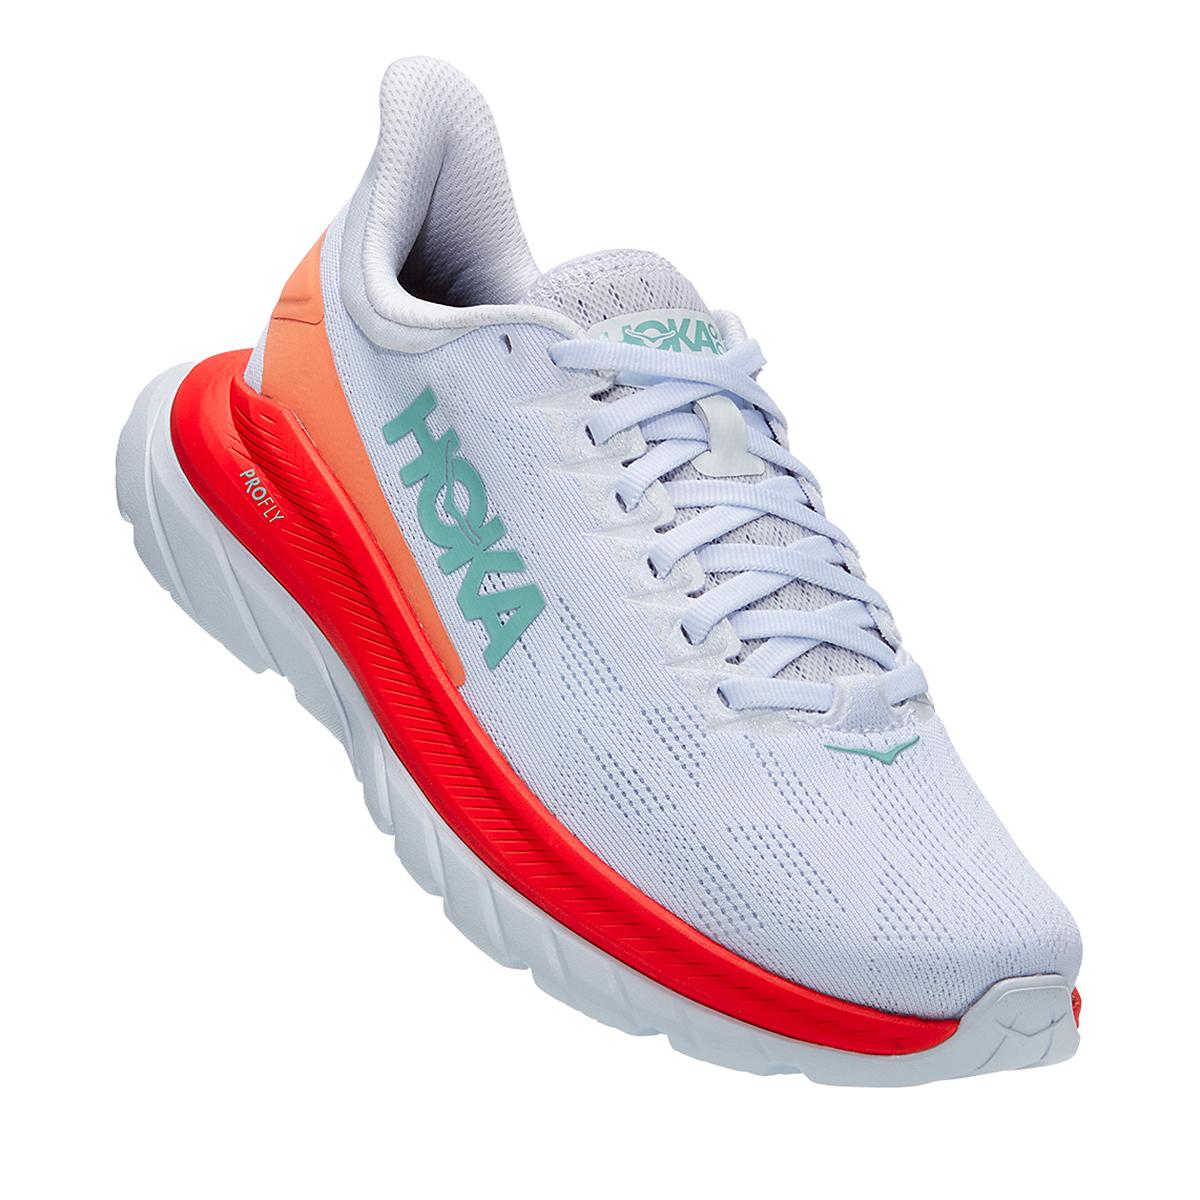 Women's Hoka One One Mach 4 Running Shoe - Color: White/Fiesta - Size: 5 - Width: Regular, White/Fiesta, large, image 1